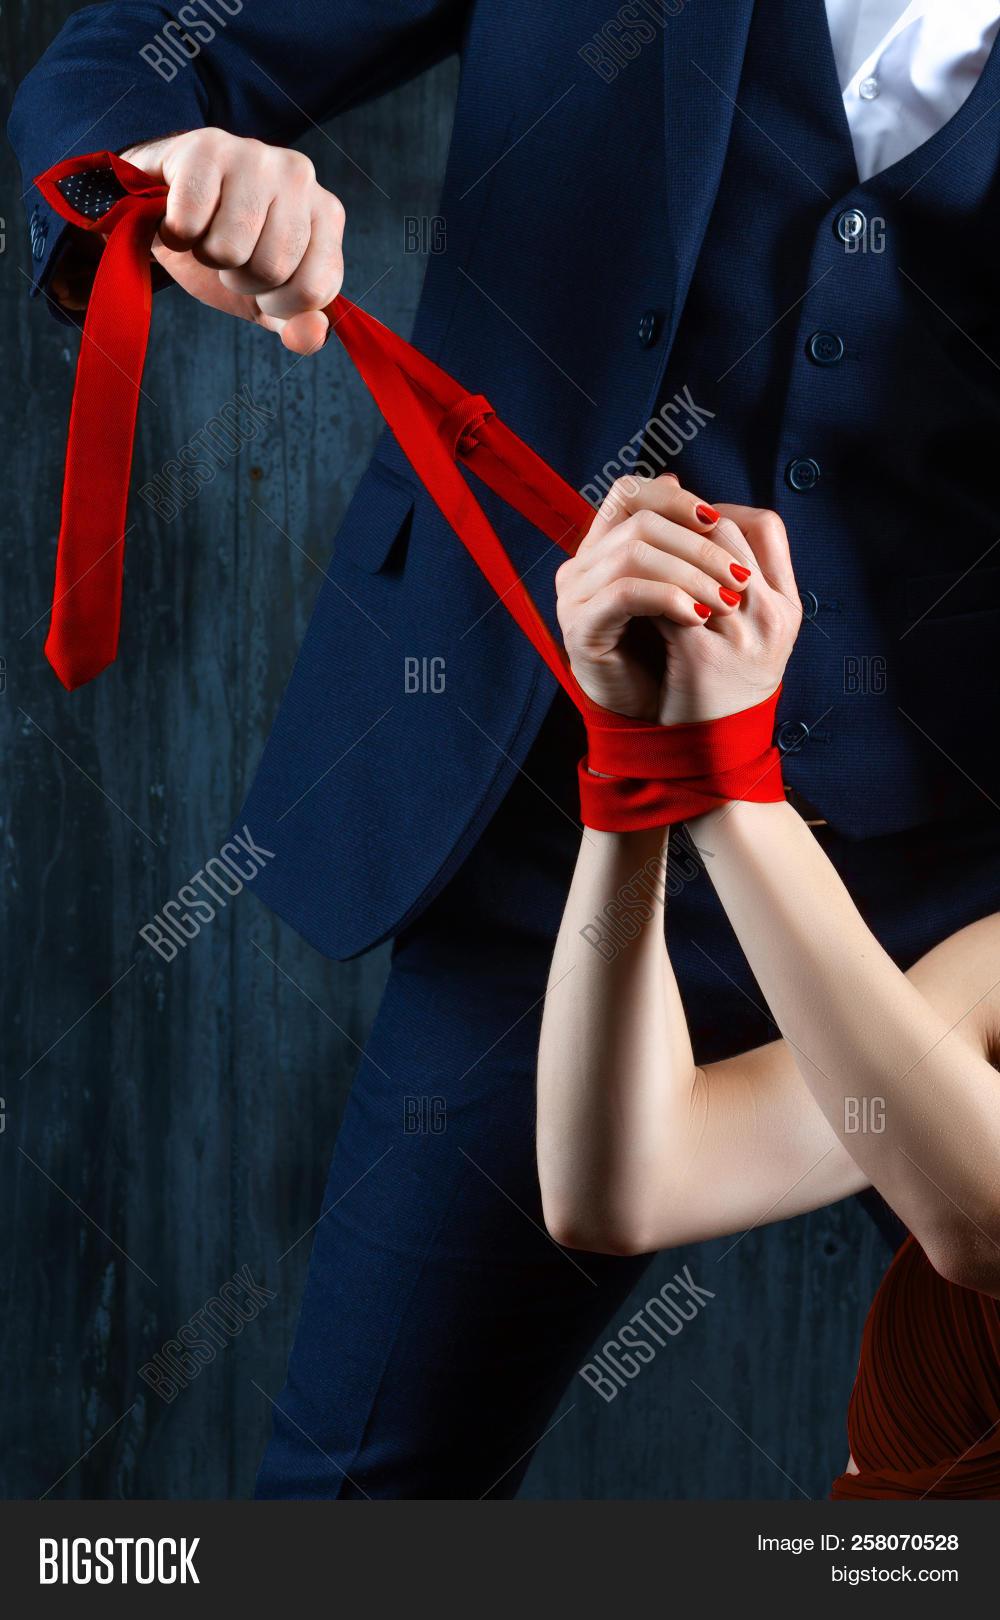 uniform dating free trial